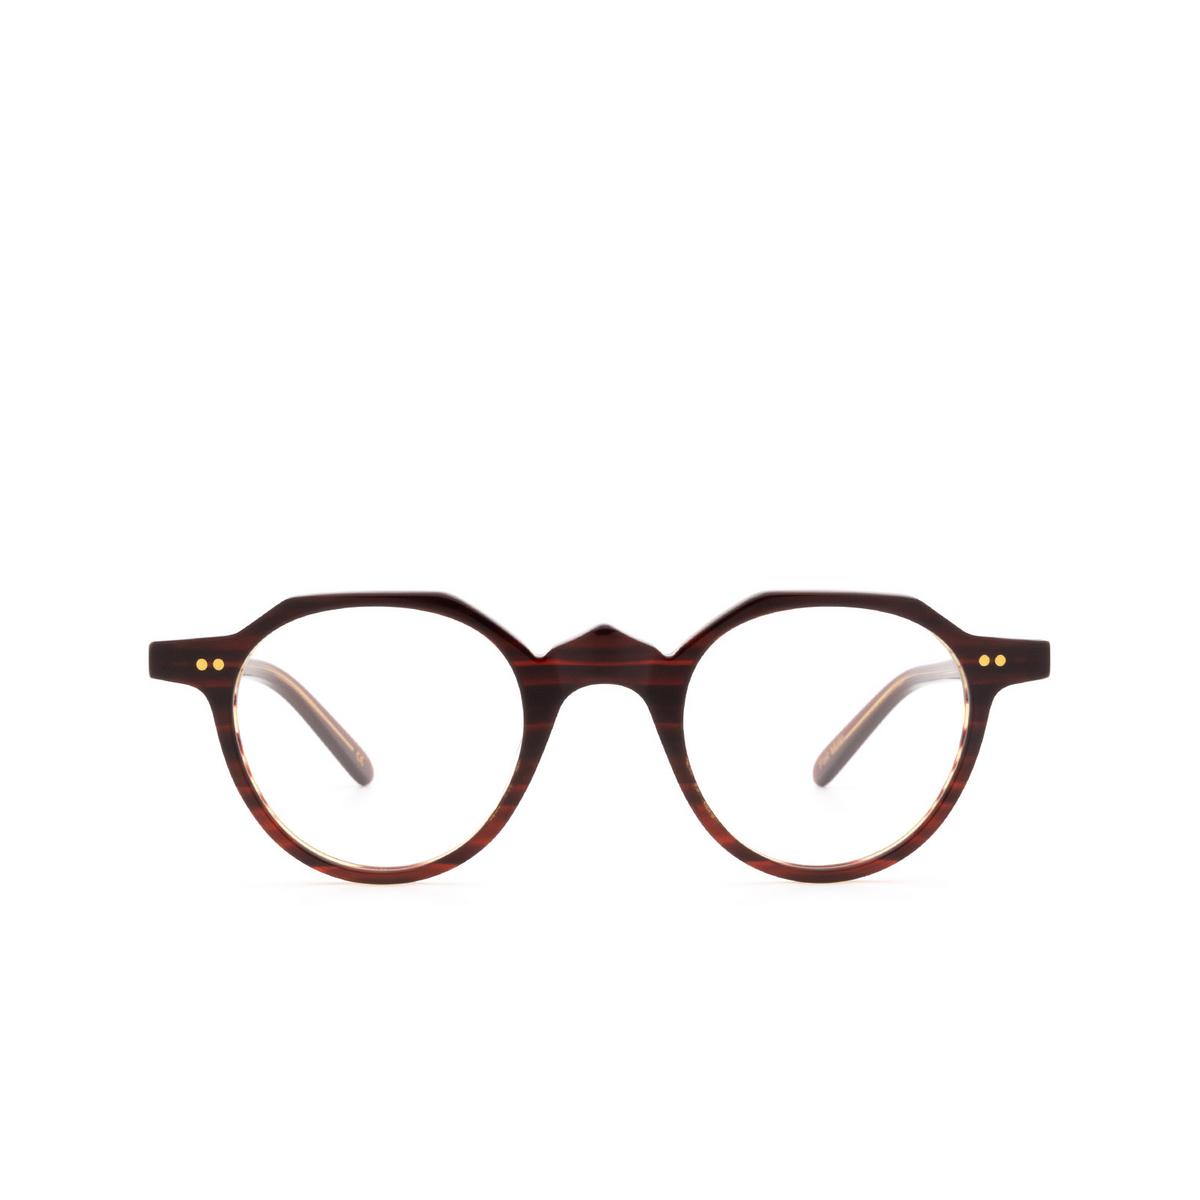 Lesca® Irregular Eyeglasses: P21 color Dark Havana 22 - front view.